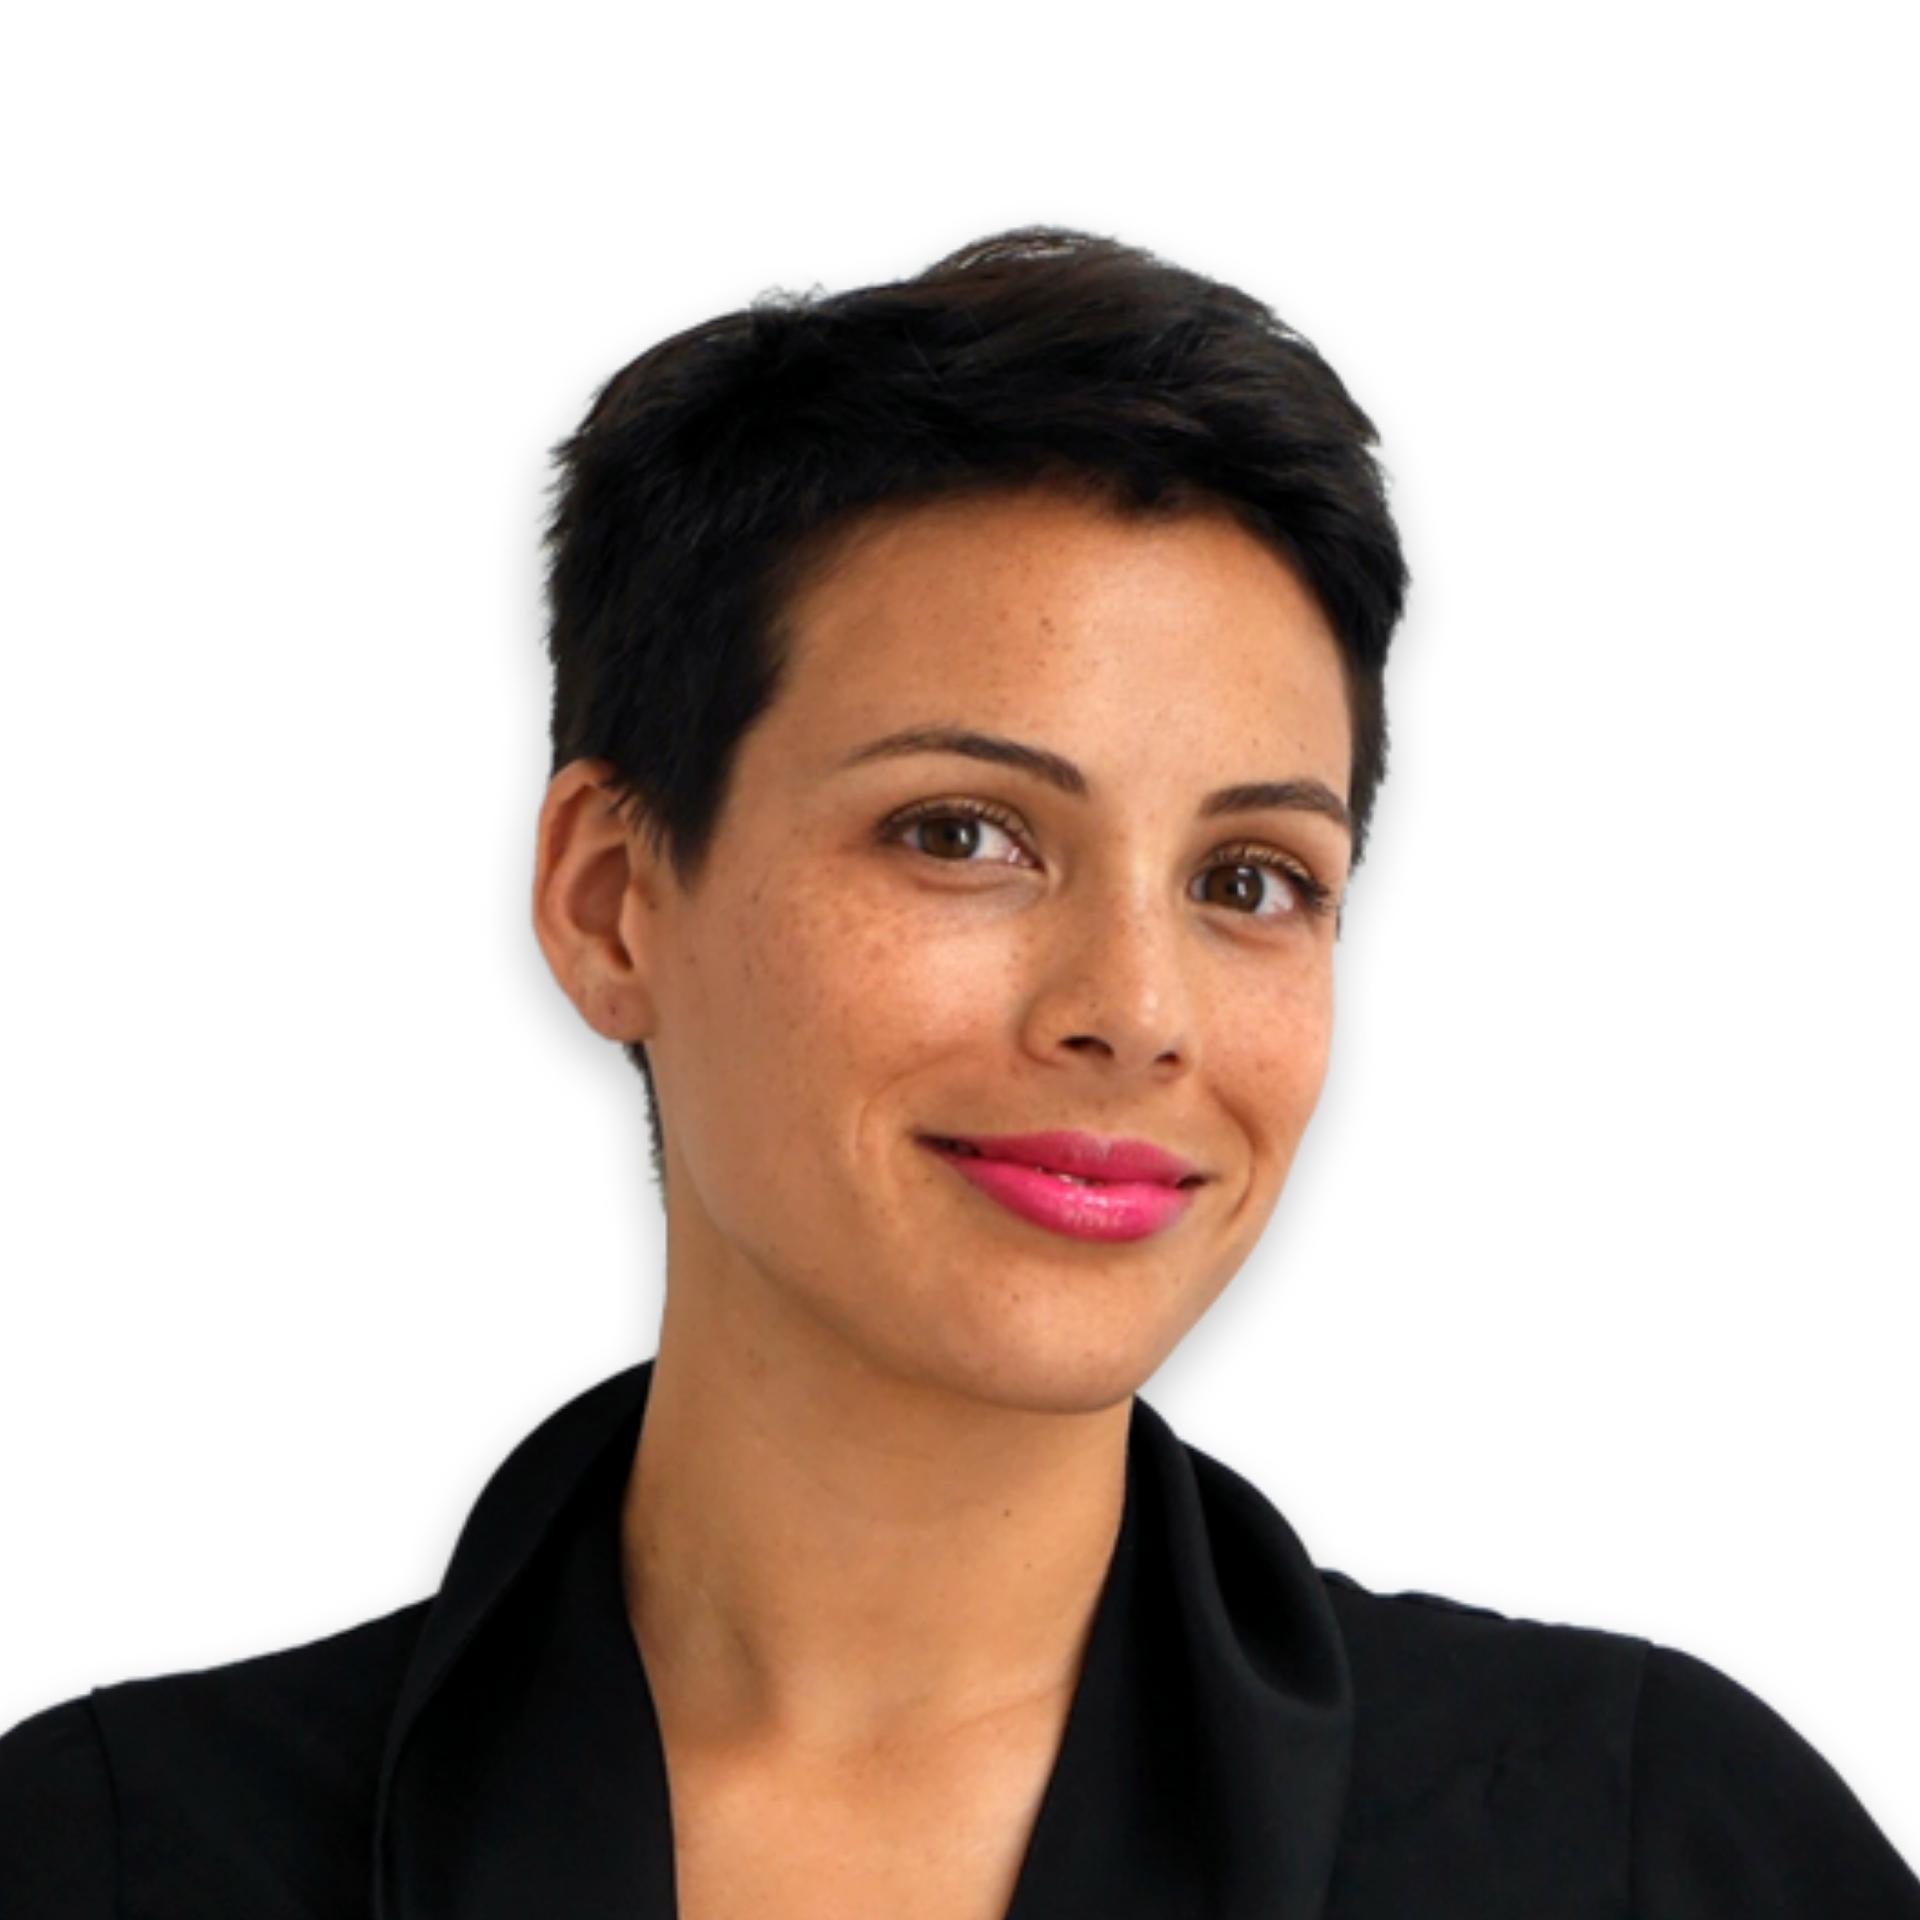 Nathalie Garcia